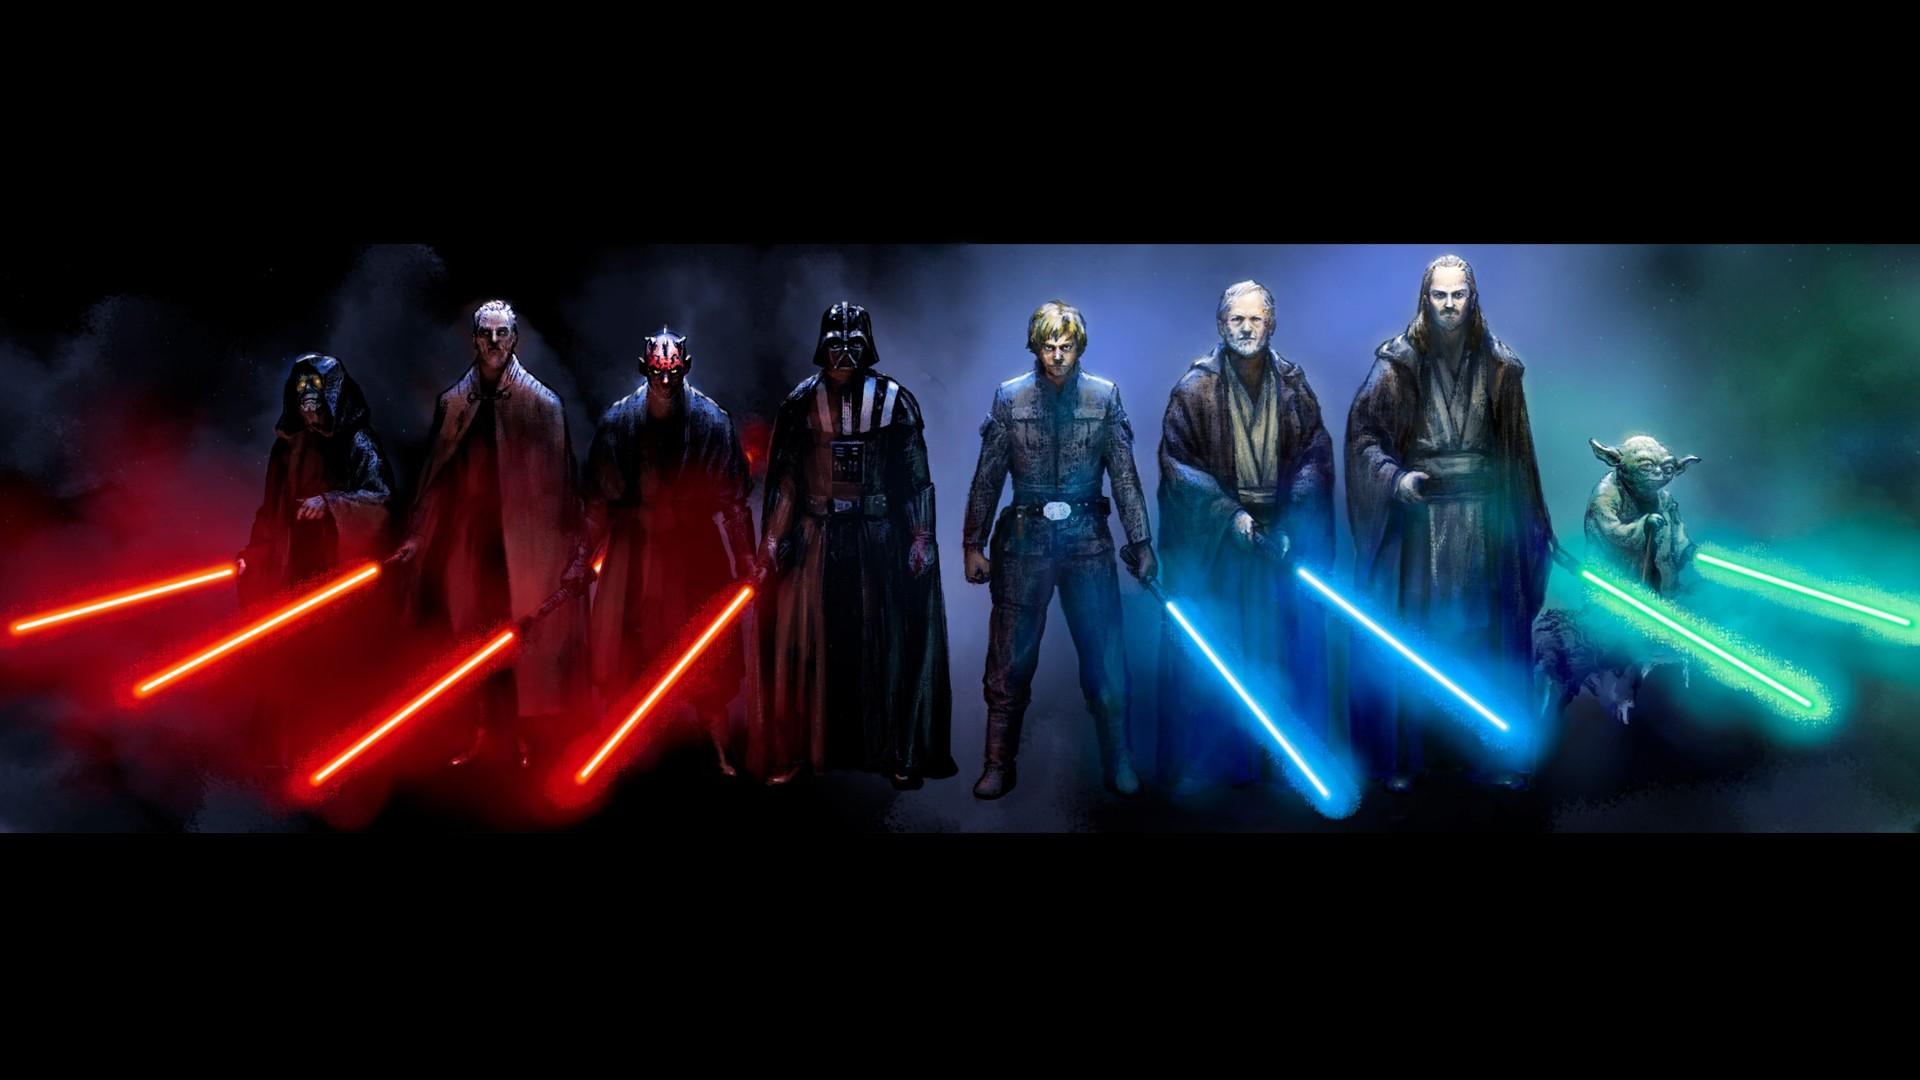 Star Wars Desktop Wallpapers | Star Wars Images |